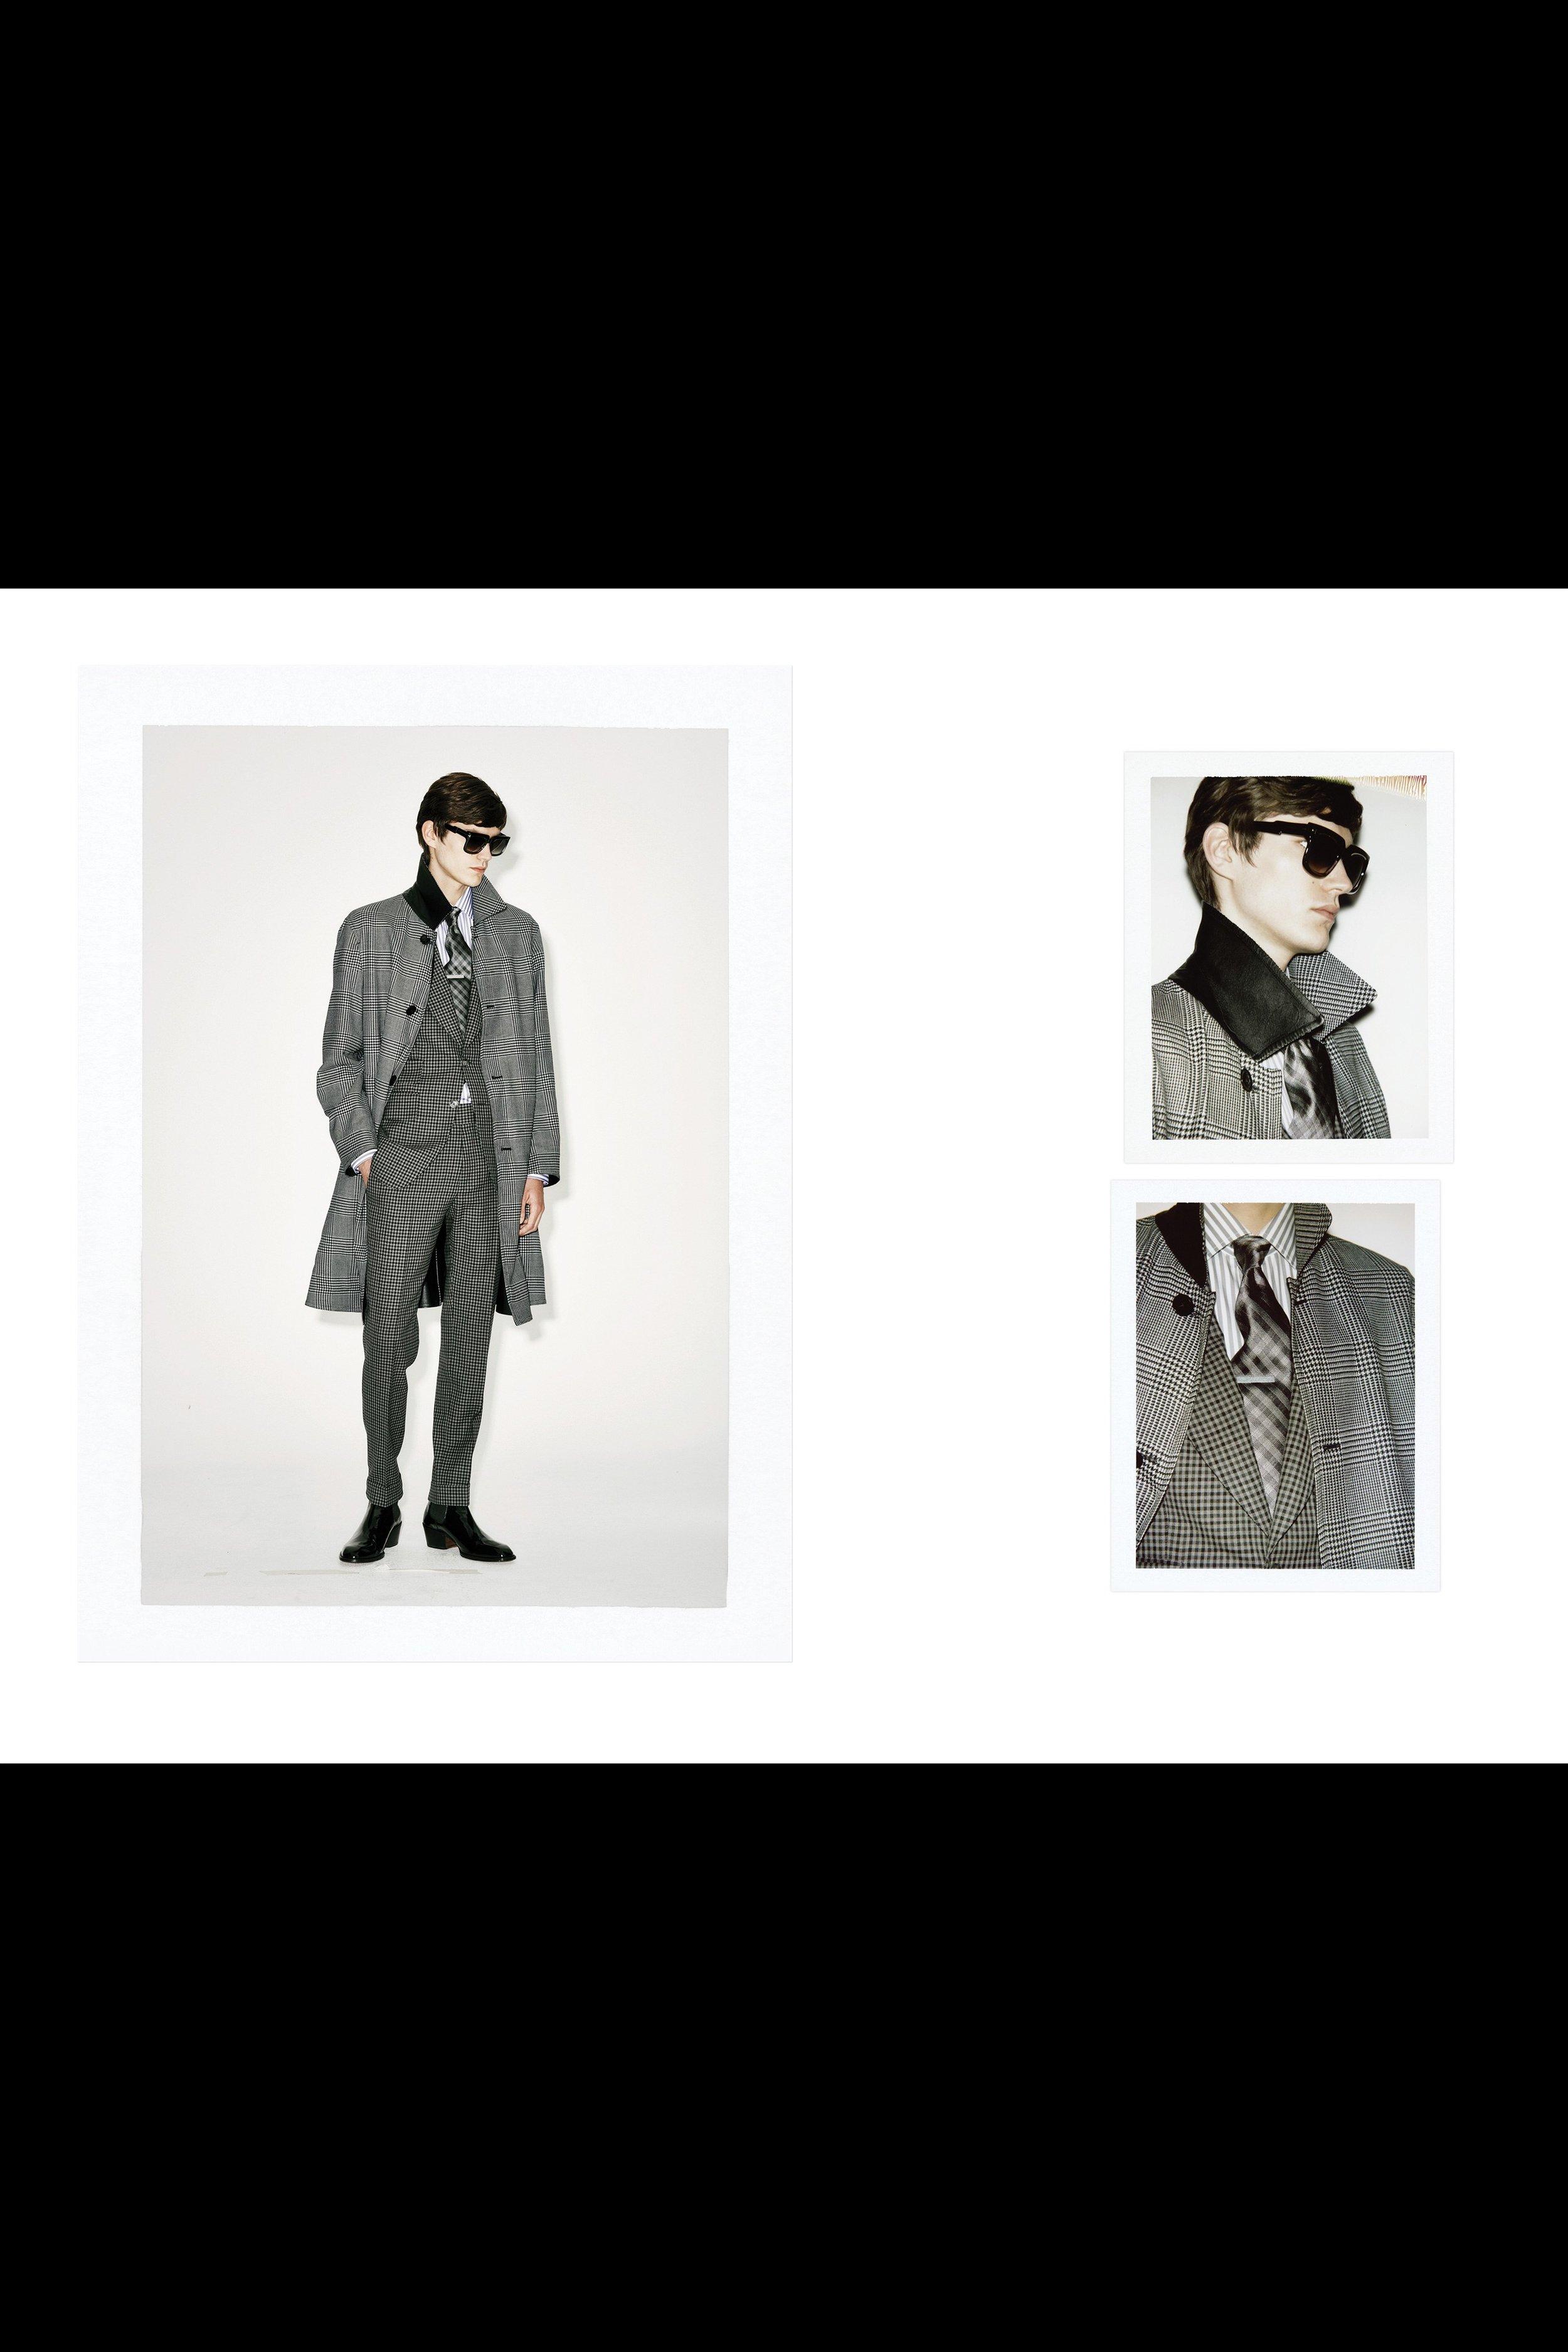 00002-Tom-Ford-vogue-menswear-spring-2019-pr.jpg